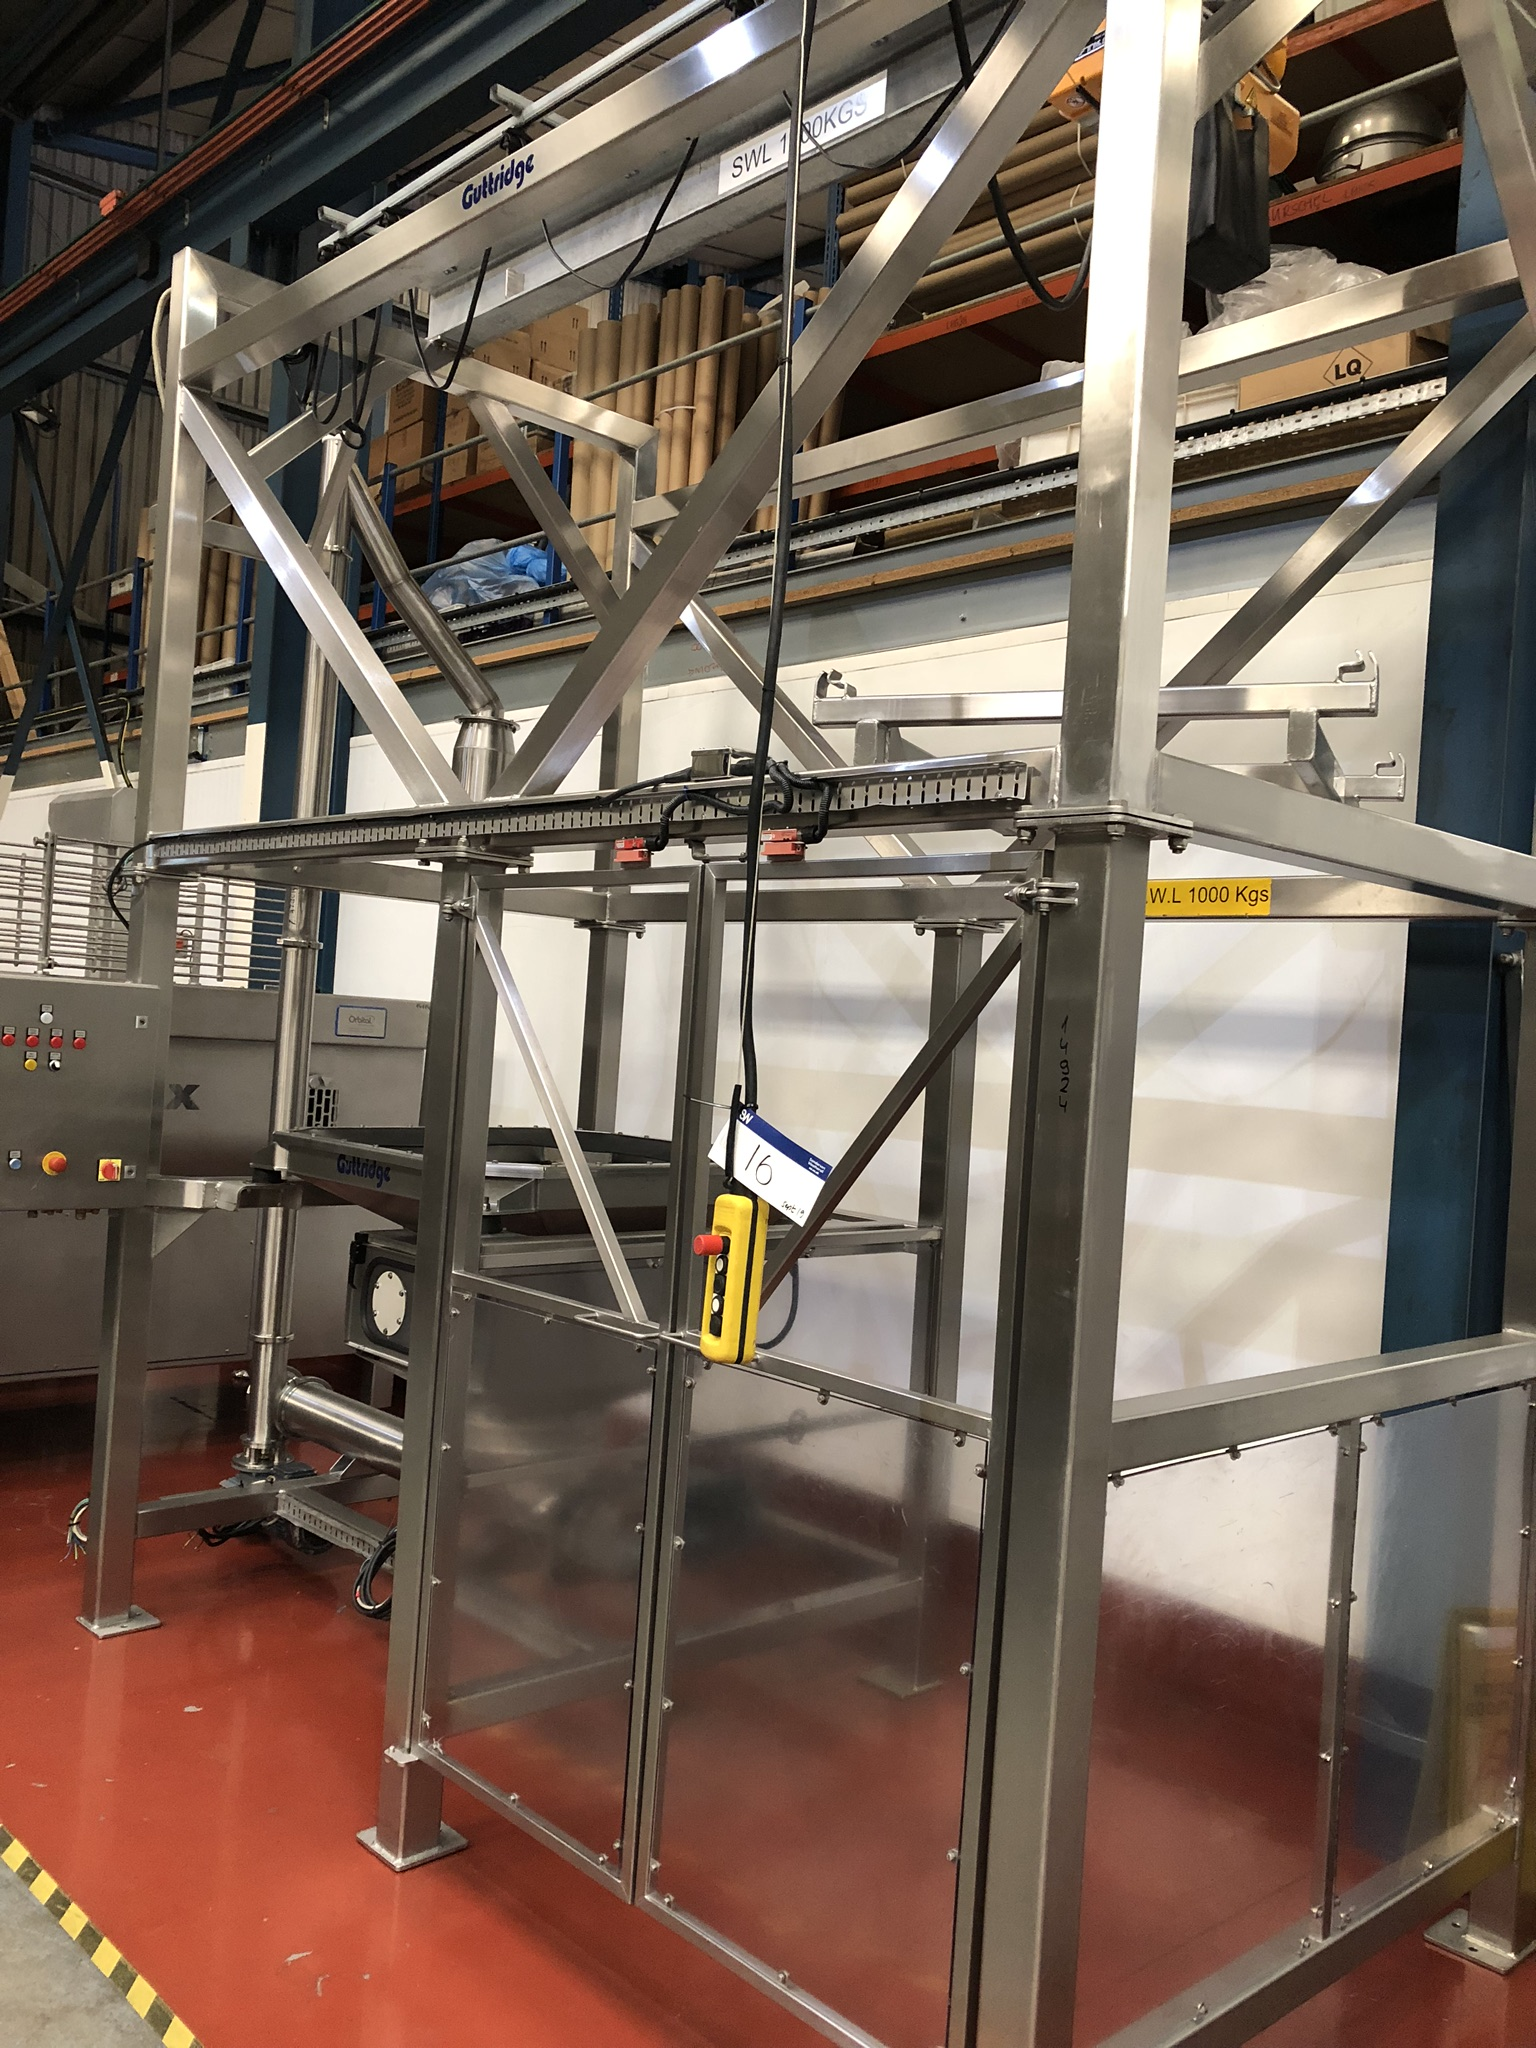 Guttridge 1000KG BULK BAG UNLOADING SYSTEM, with Star Liftket electric chain hoist, lift out